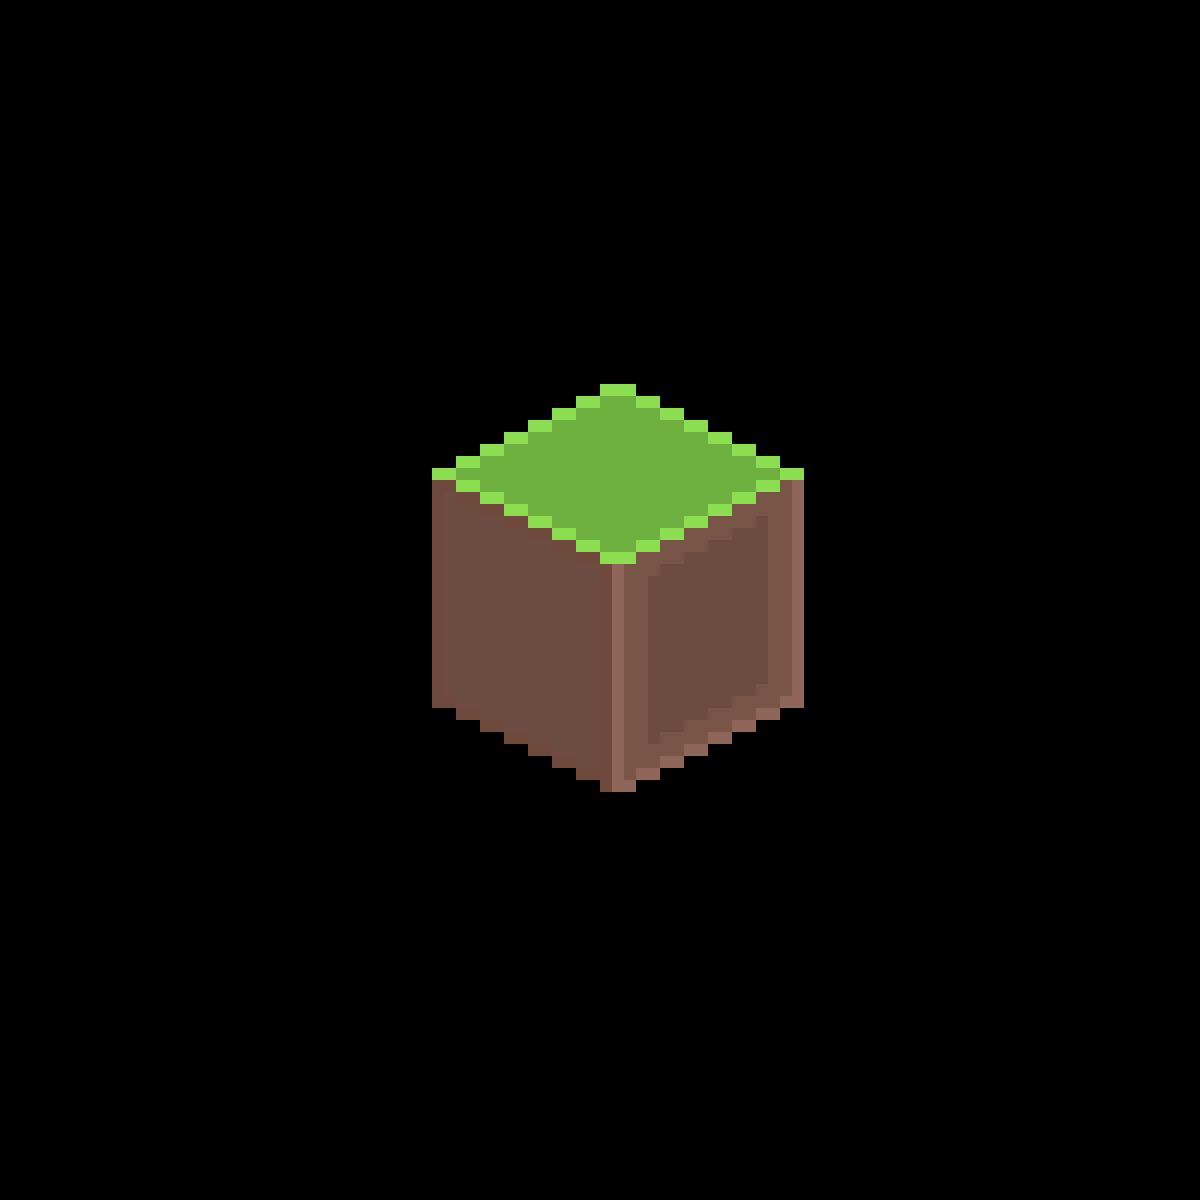 ugly minecraft block by Sherlockx7